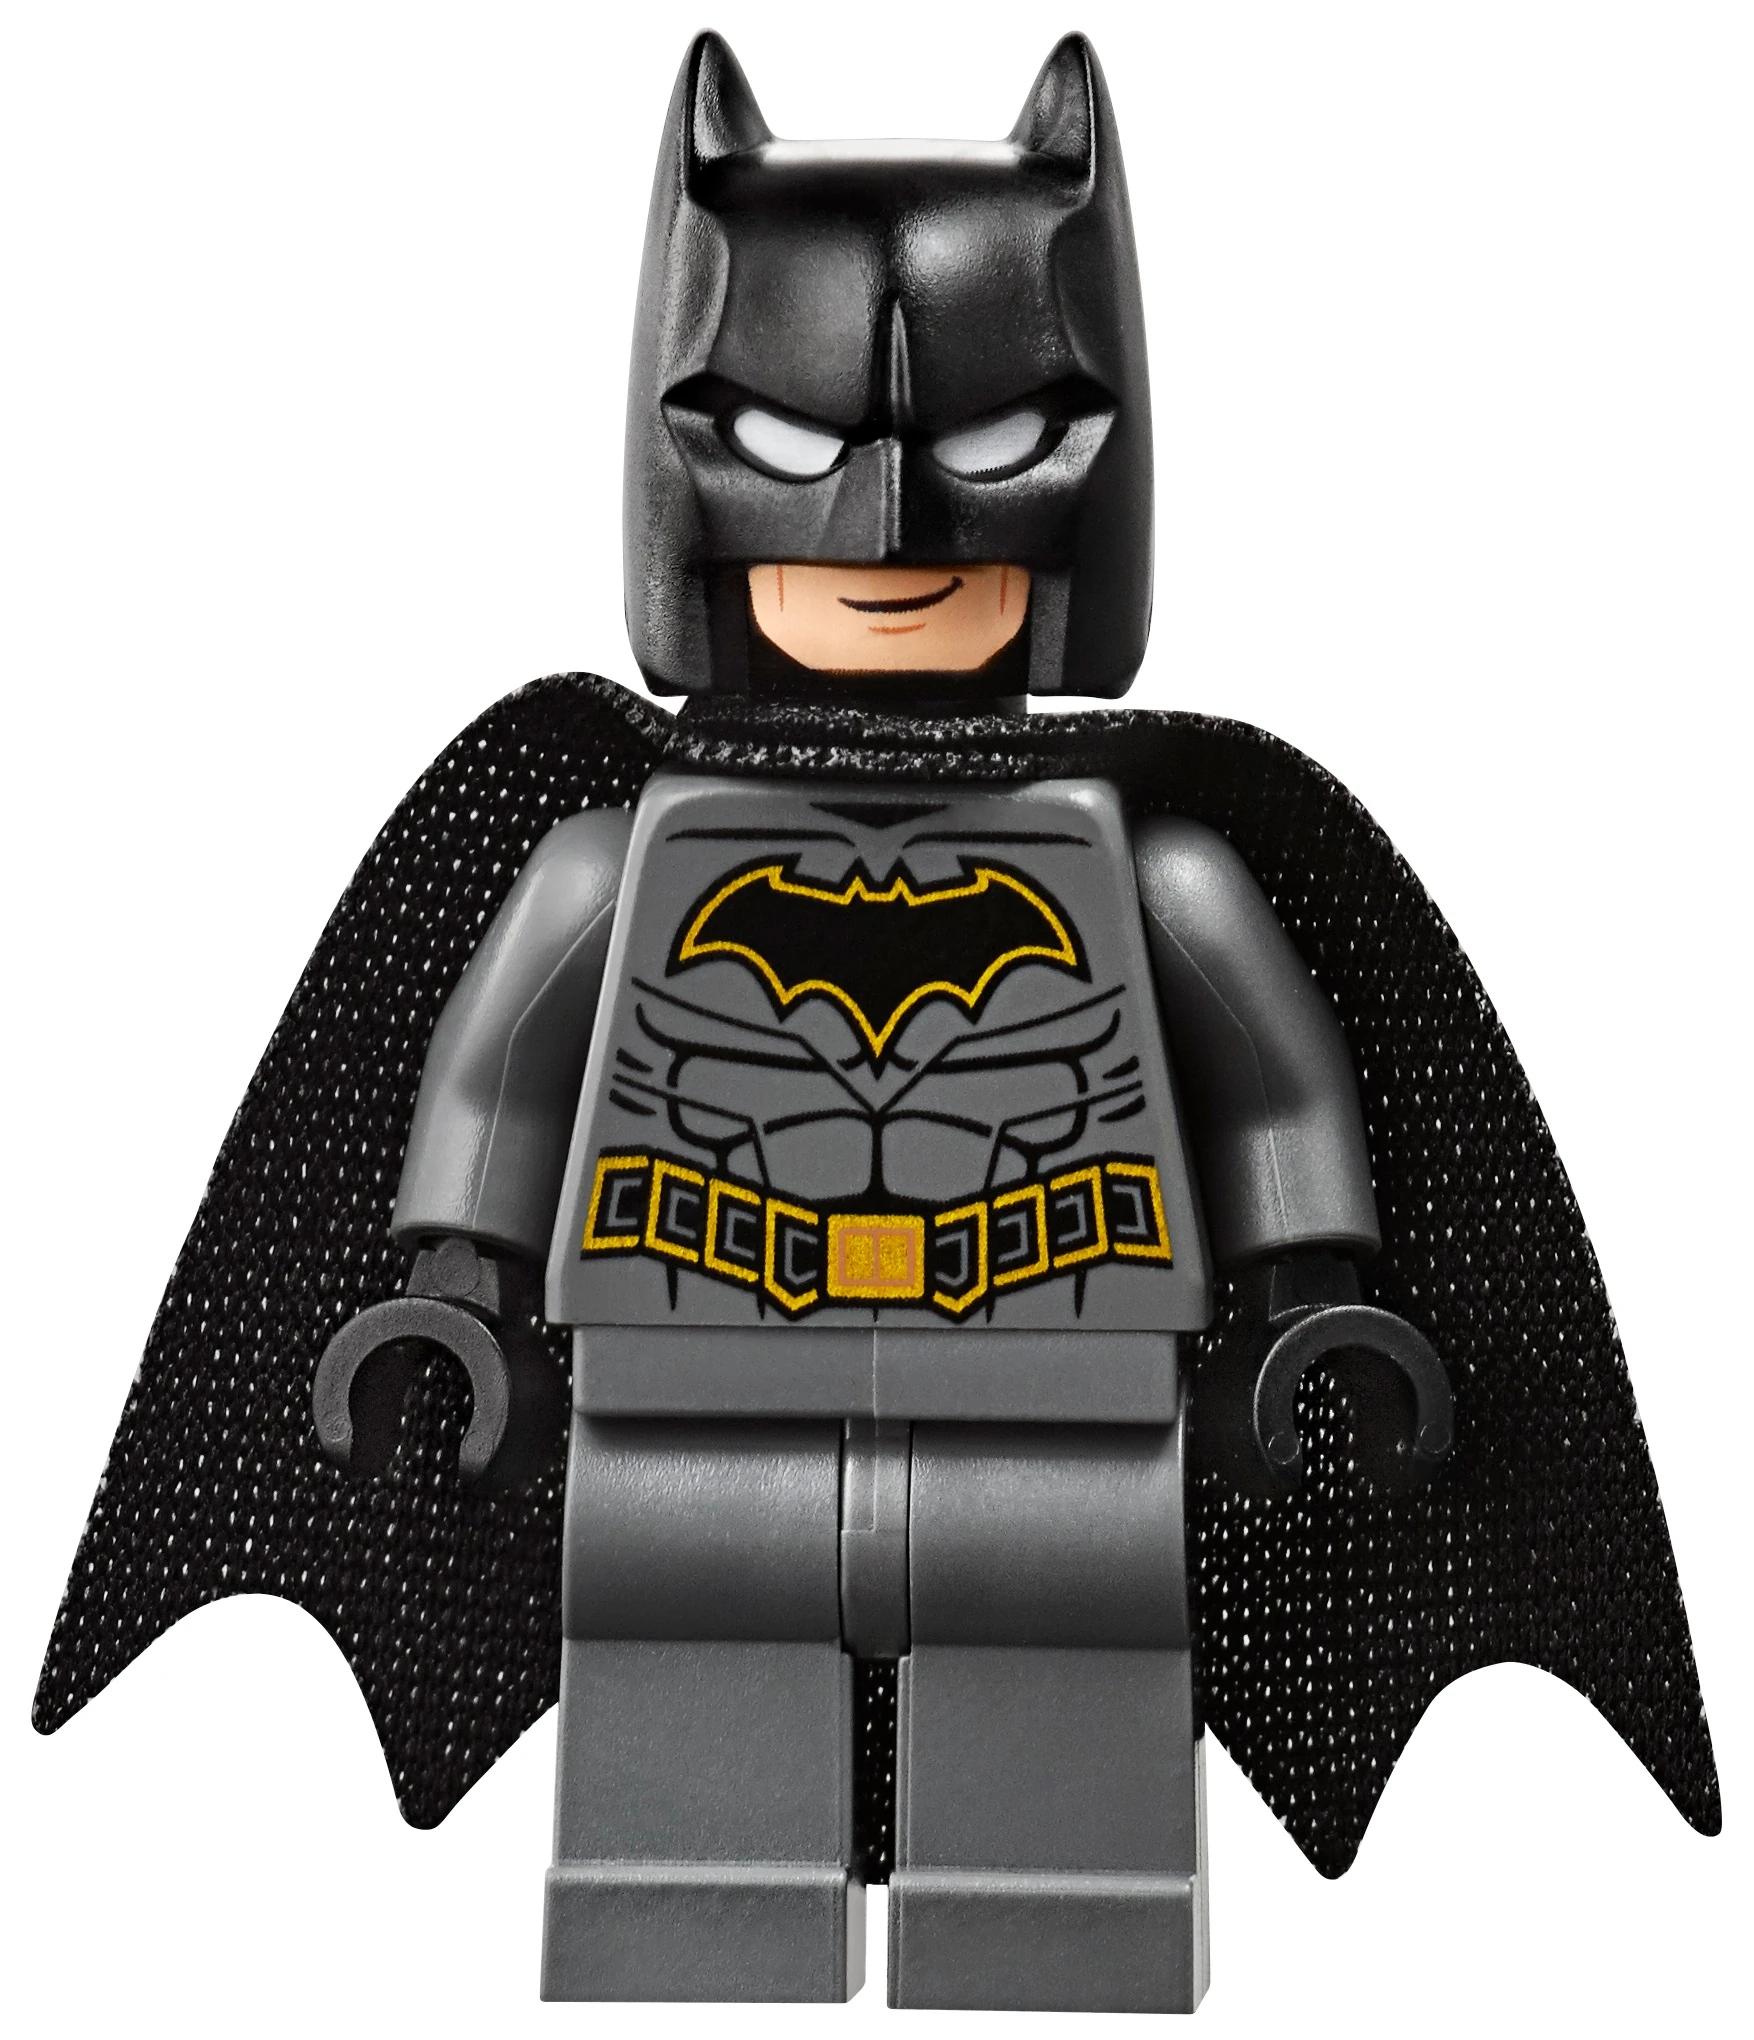 Batman (Minifigure) | Brickipedia | FANDOM powered by Wikia